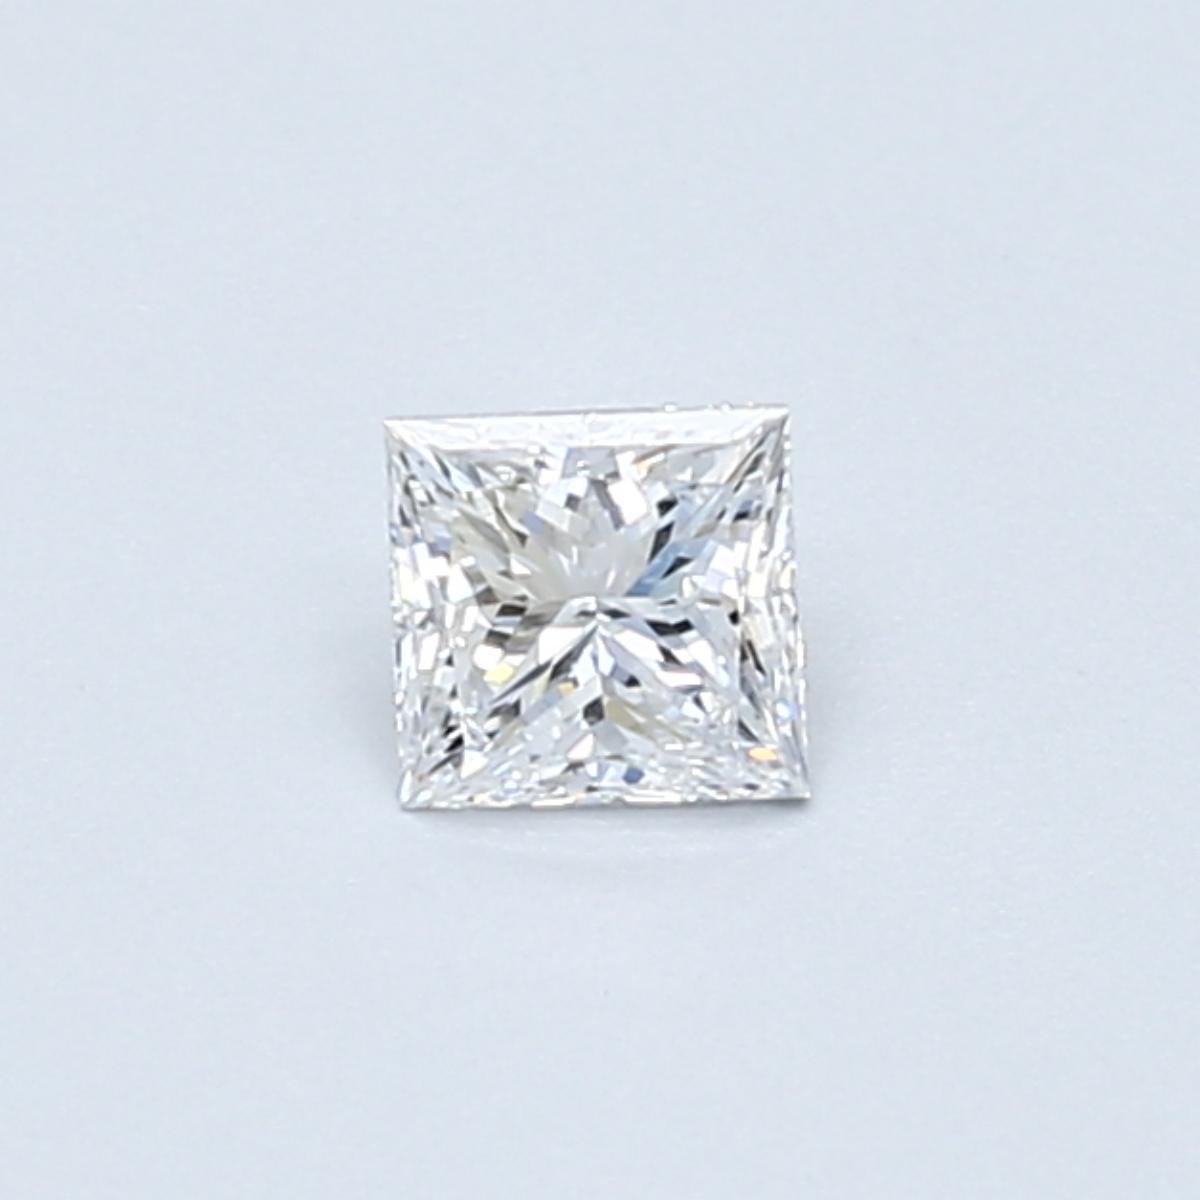 .30 carat Princess Diamond, Very Good cut, graded by the GIA laboratories.